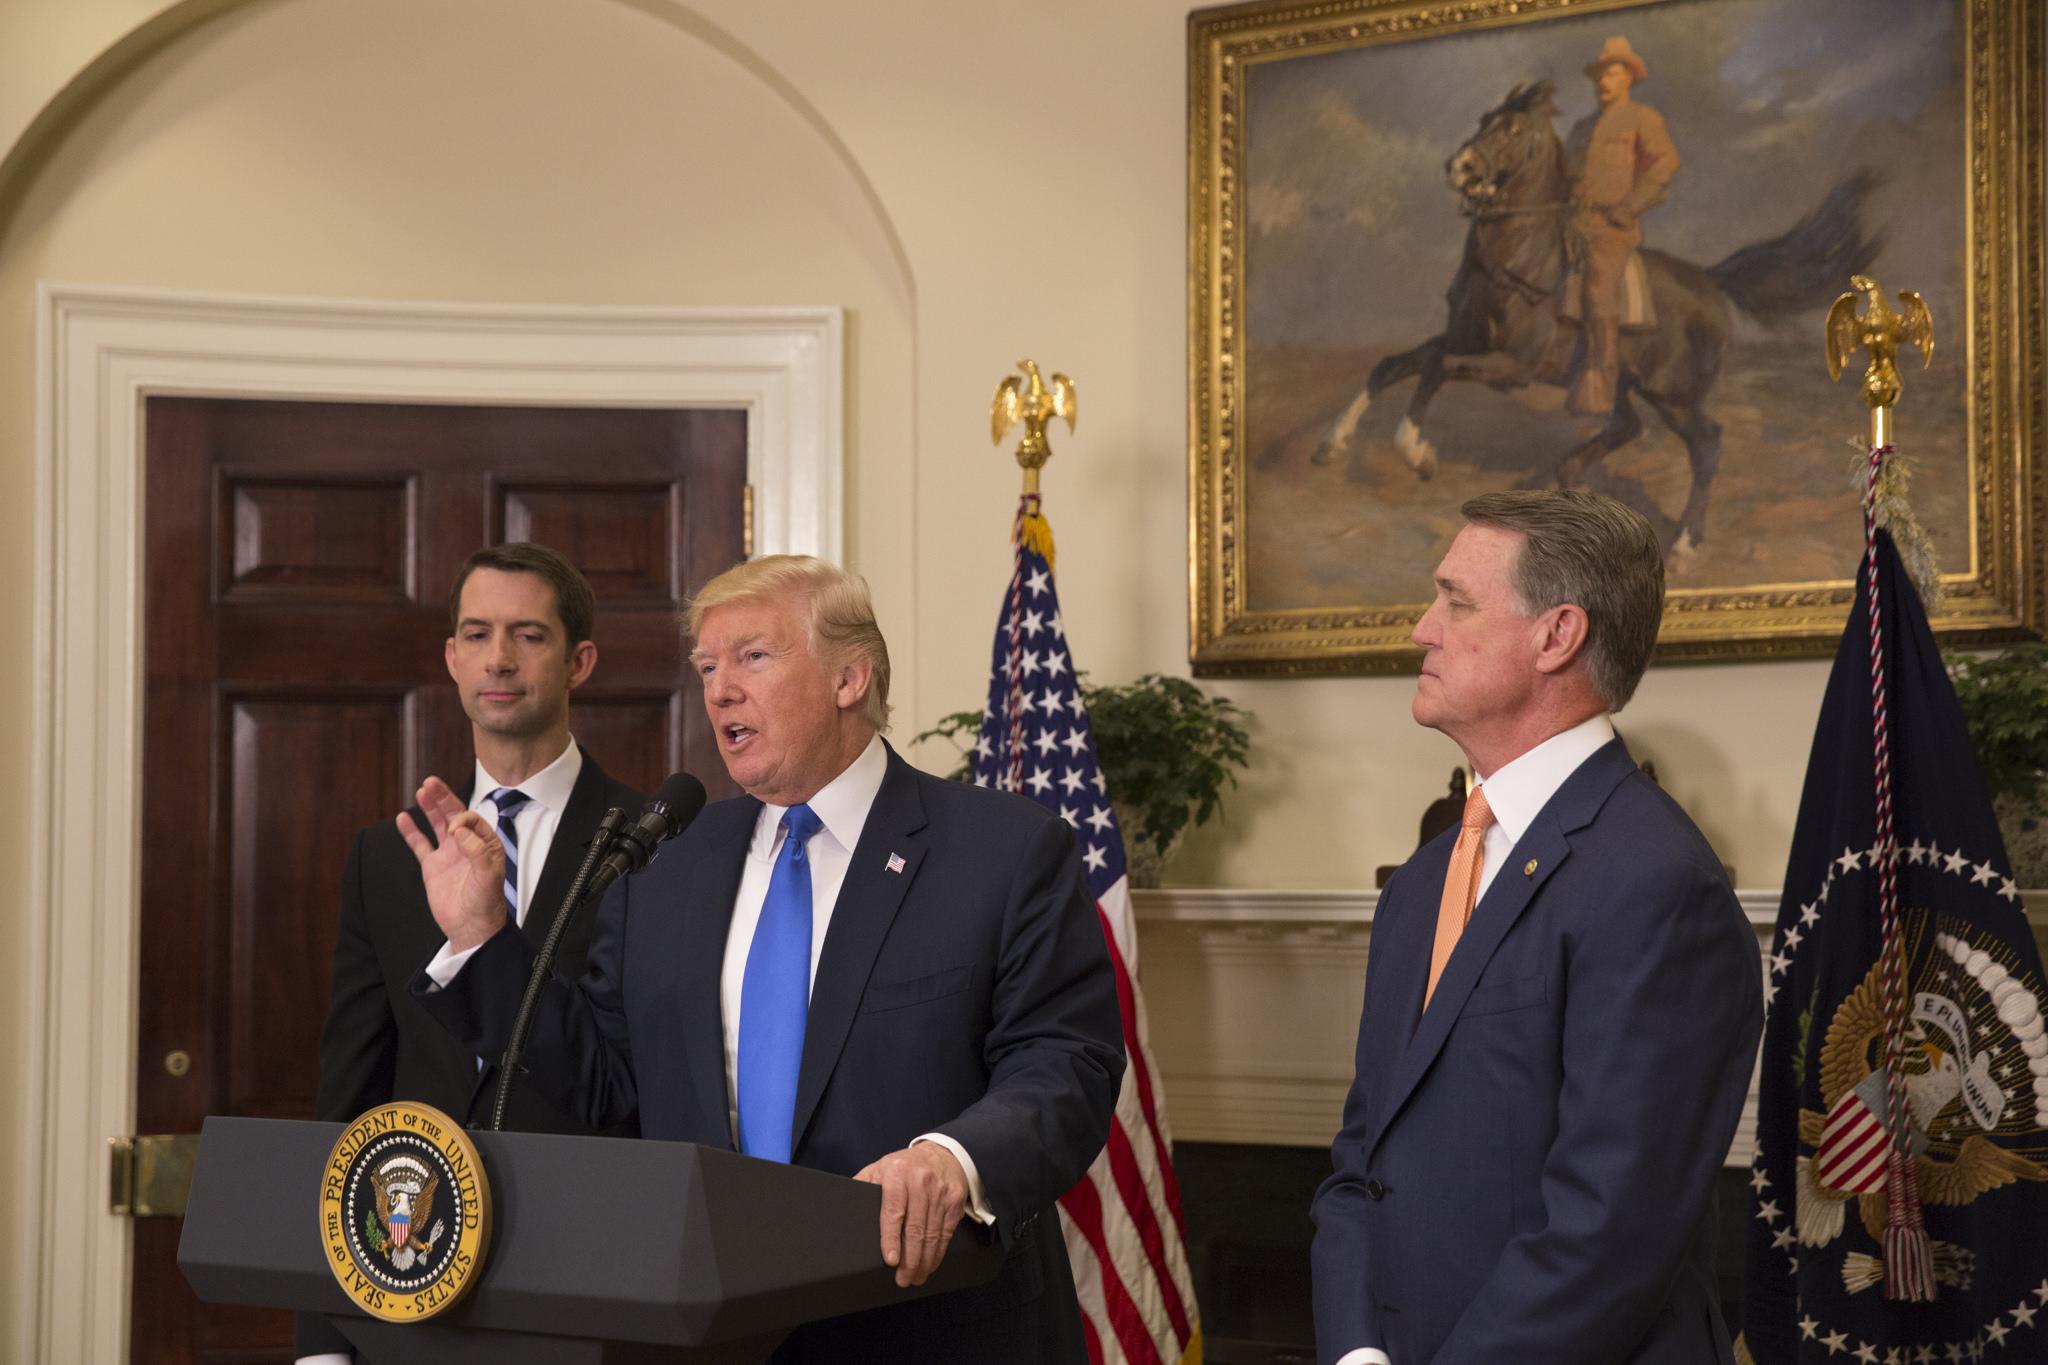 President_Donald_J._Trump,_Senator_Tom_Cotton,_and_Senator_David_Perdue,_August_2,_2017_(36182228582).jpg